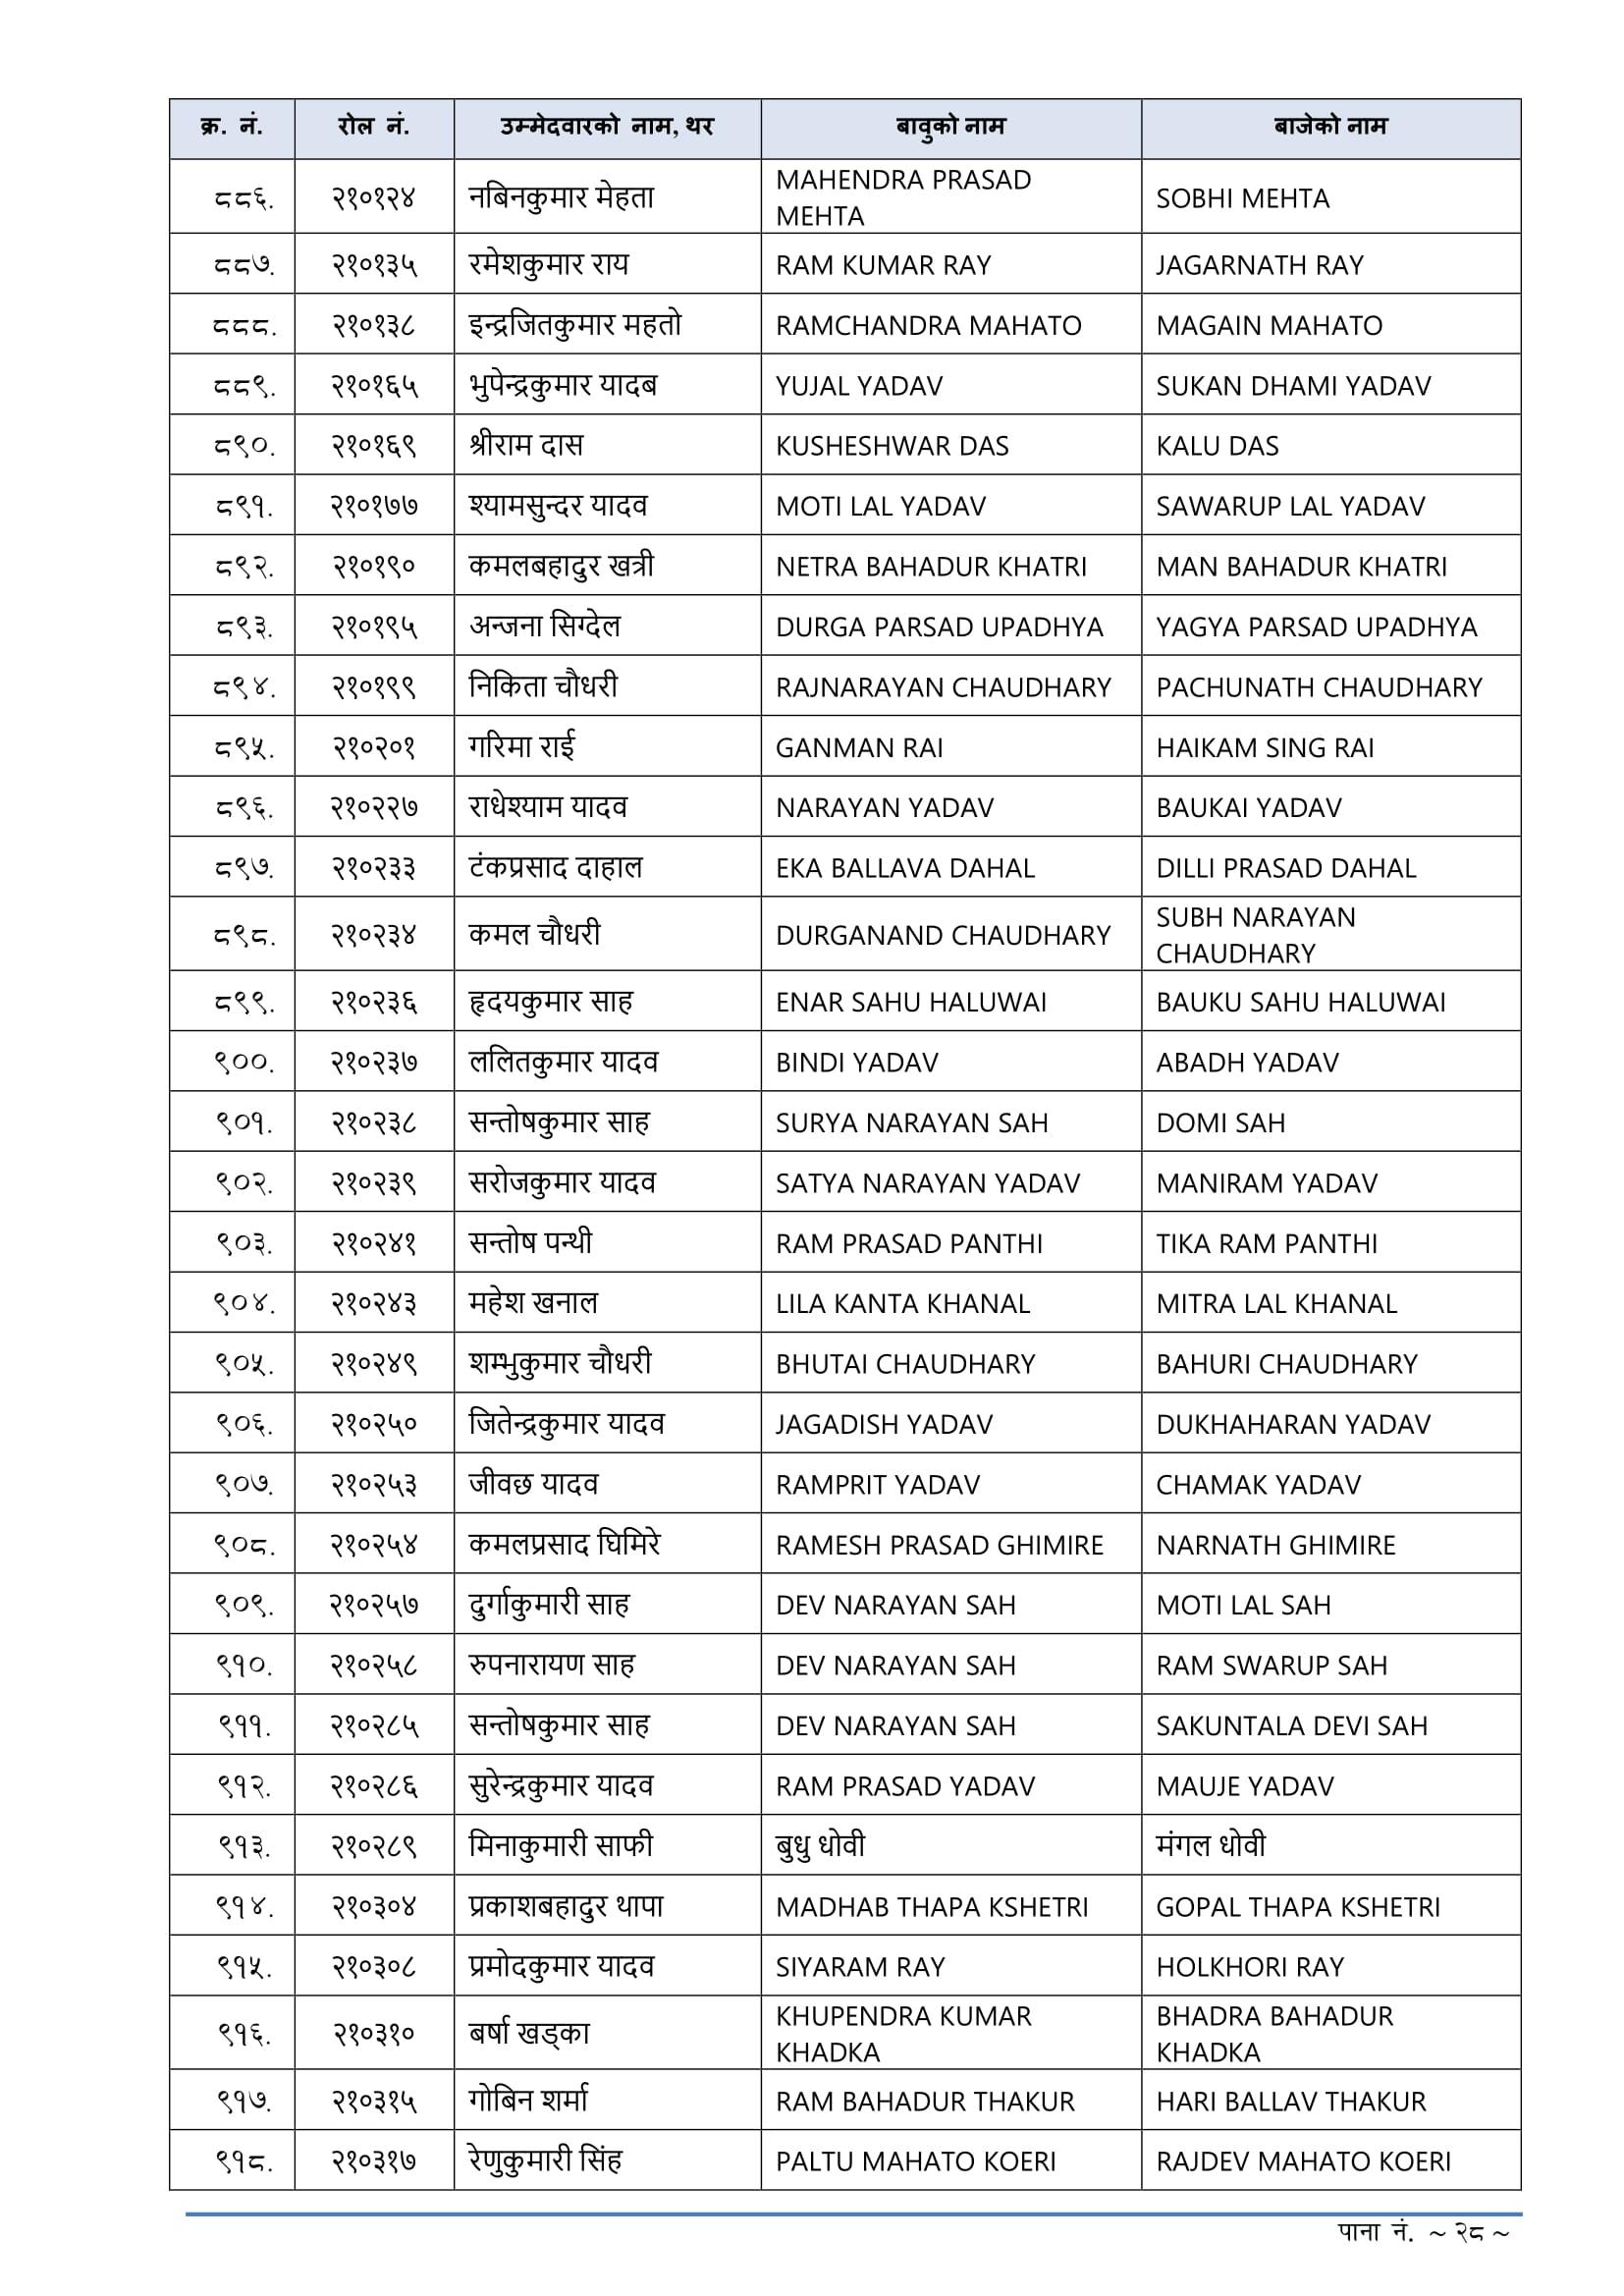 Lok Sewa Aayog Jaleshwar Nayab Subba Result 2076 has been published. Lok Sewa Aayog Jaleshwar Nayab Subba Result 2076.  Lok Sewa Aayog Jaleshwar Nasu Result 2076, Lok Sewa Aayog Jaleshwar Nasu Result, Jaleshwar Nasu Result 2076,Jaleshwar Nasu Result,lok sewa natija,Lok Sewa Natija 2076 , Lok Sewa Result,Lok Sewa Result 2076,Lok Sewa Aayog Natija,Lok Sewa Aayog Natija 2076,lok sewa aayog result,Lok Sewa Aayog Result 2076,Lok sewa Aayog Sthaniya Taha result ,Lok sewa Sthaniya Taha result, Lok Sewa Nayab Subba Result,lok sewa Nayab Subba result, Lok Sewa Result Nayab Subba,Lok Sewa Result Nayab Subba 2076 , psc Nayab Subba result , PSC Nayab Subba Result 2076, Sthaniya Taha Nayab Subba natija ,Sthaniya Taha Nayab Subba result,Lok sewa aayog Nayab Subba Result,lok sewa aayog Nayab Subba result 2076,Lok Sewa Nasu Result,lok sewa Nasu result, Lok Sewa Result Nasu,Lok Sewa Result Nasu 2076 , psc Nasu result , PSC Nasu Result 2076, Sthaniya Taha Nasu natija ,Sthaniya Taha Nasu result,Lok sewa aayog Nasu Result,lok sewa aayog Nasu result 2076,नायब सुब्बा पाँचौं तह लिखित नतिजा,नायब सुब्बा नतिजा,,पाँचौं तह नायब सुब्बा नतिजा,पाँचौं तह नतिजा,स्थानीय तह नायब सुब्बा नतिजा,स्थानीय तह नतिजा,स्थानीय तहको अधिकृत छैठौ तह,